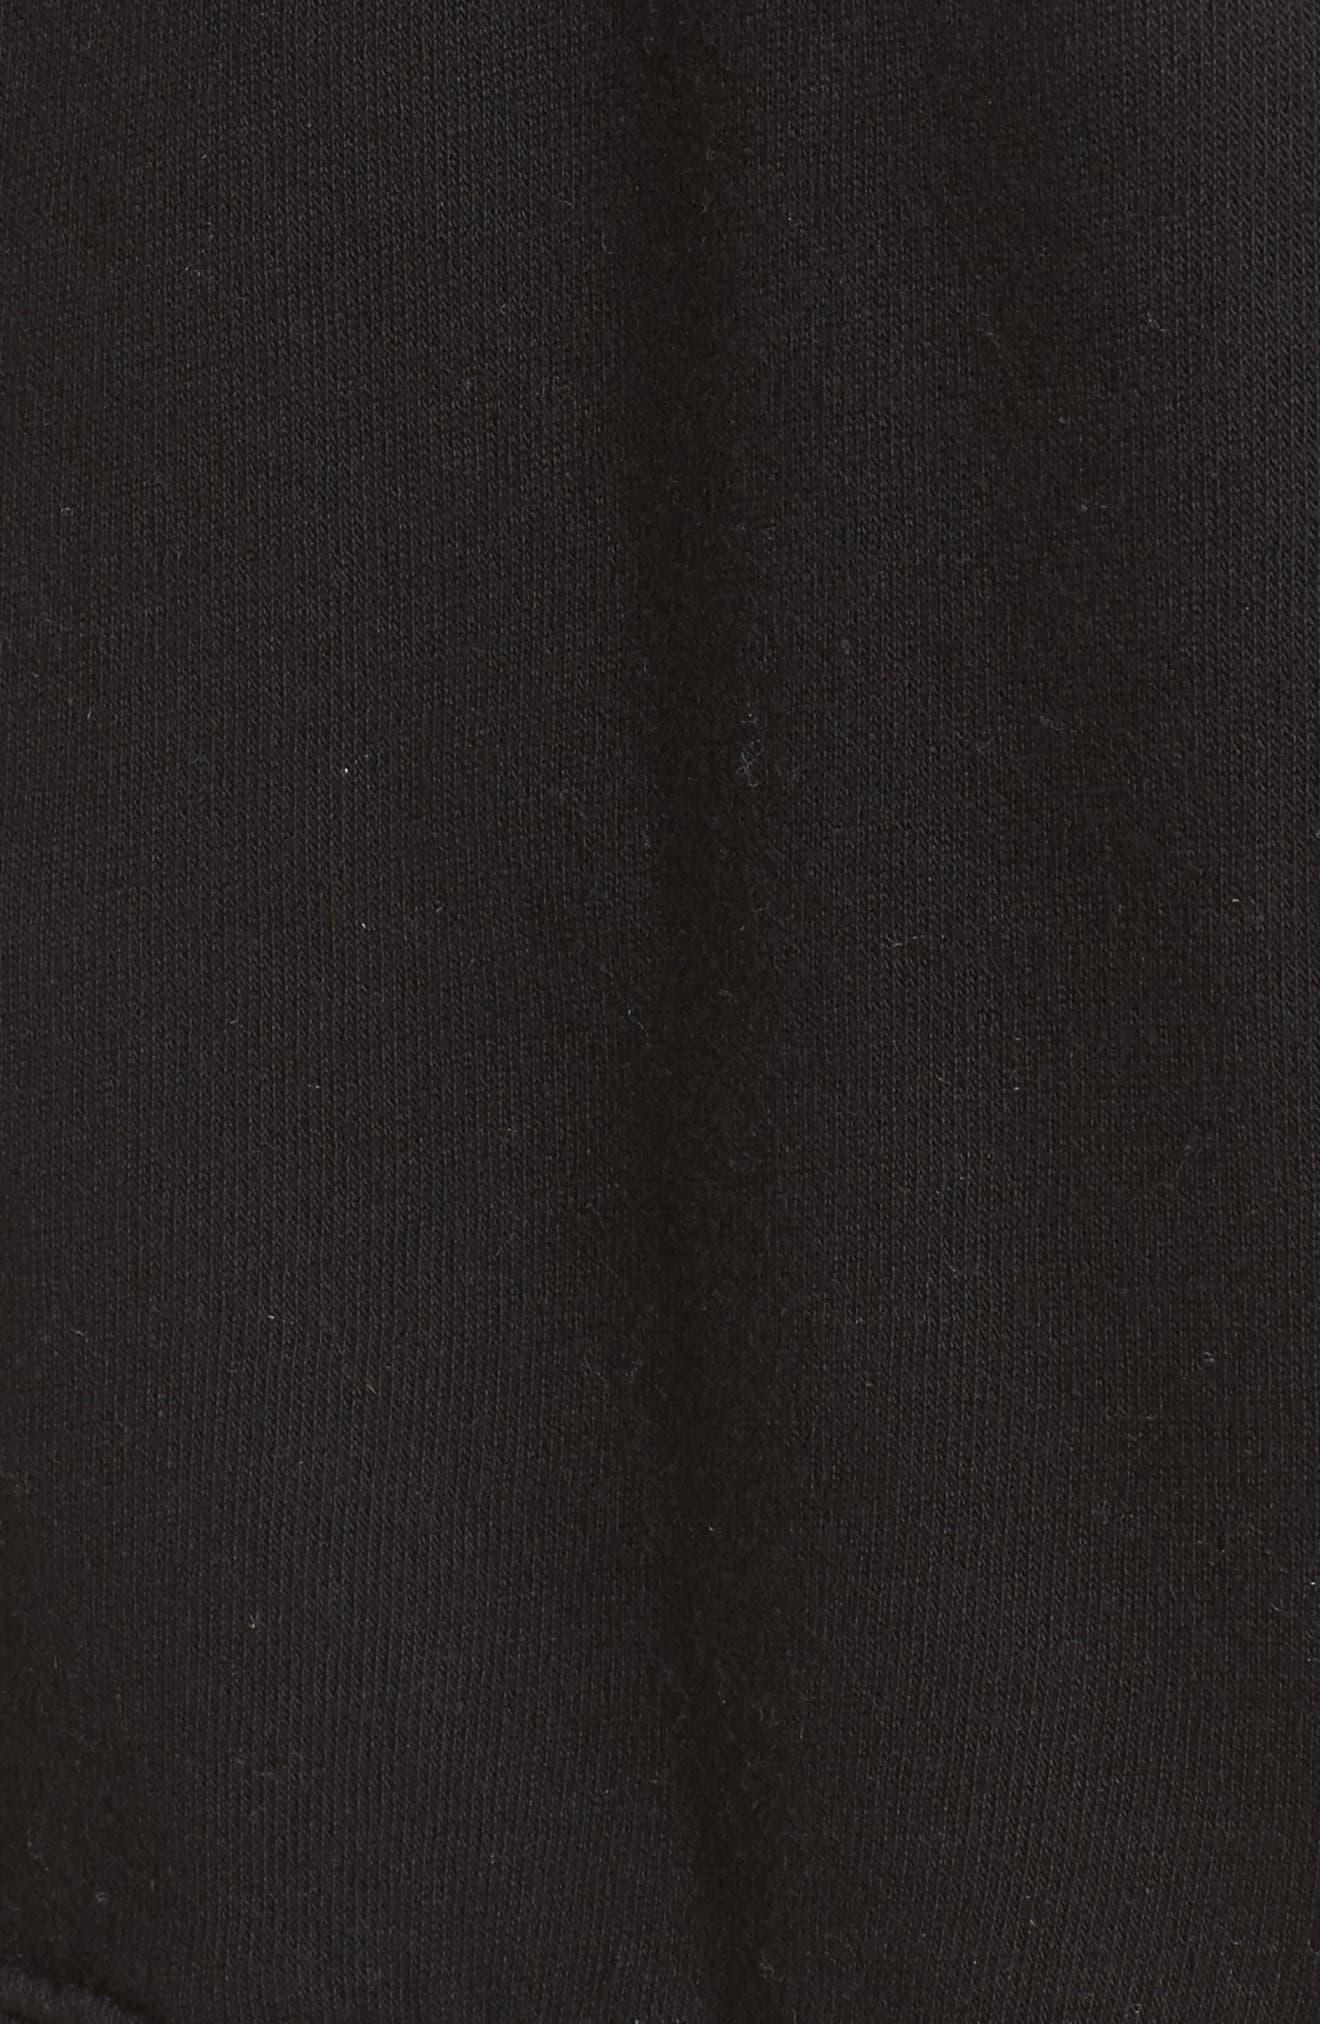 Wino - Sommers Sweatshirt,                             Alternate thumbnail 5, color,                             Black